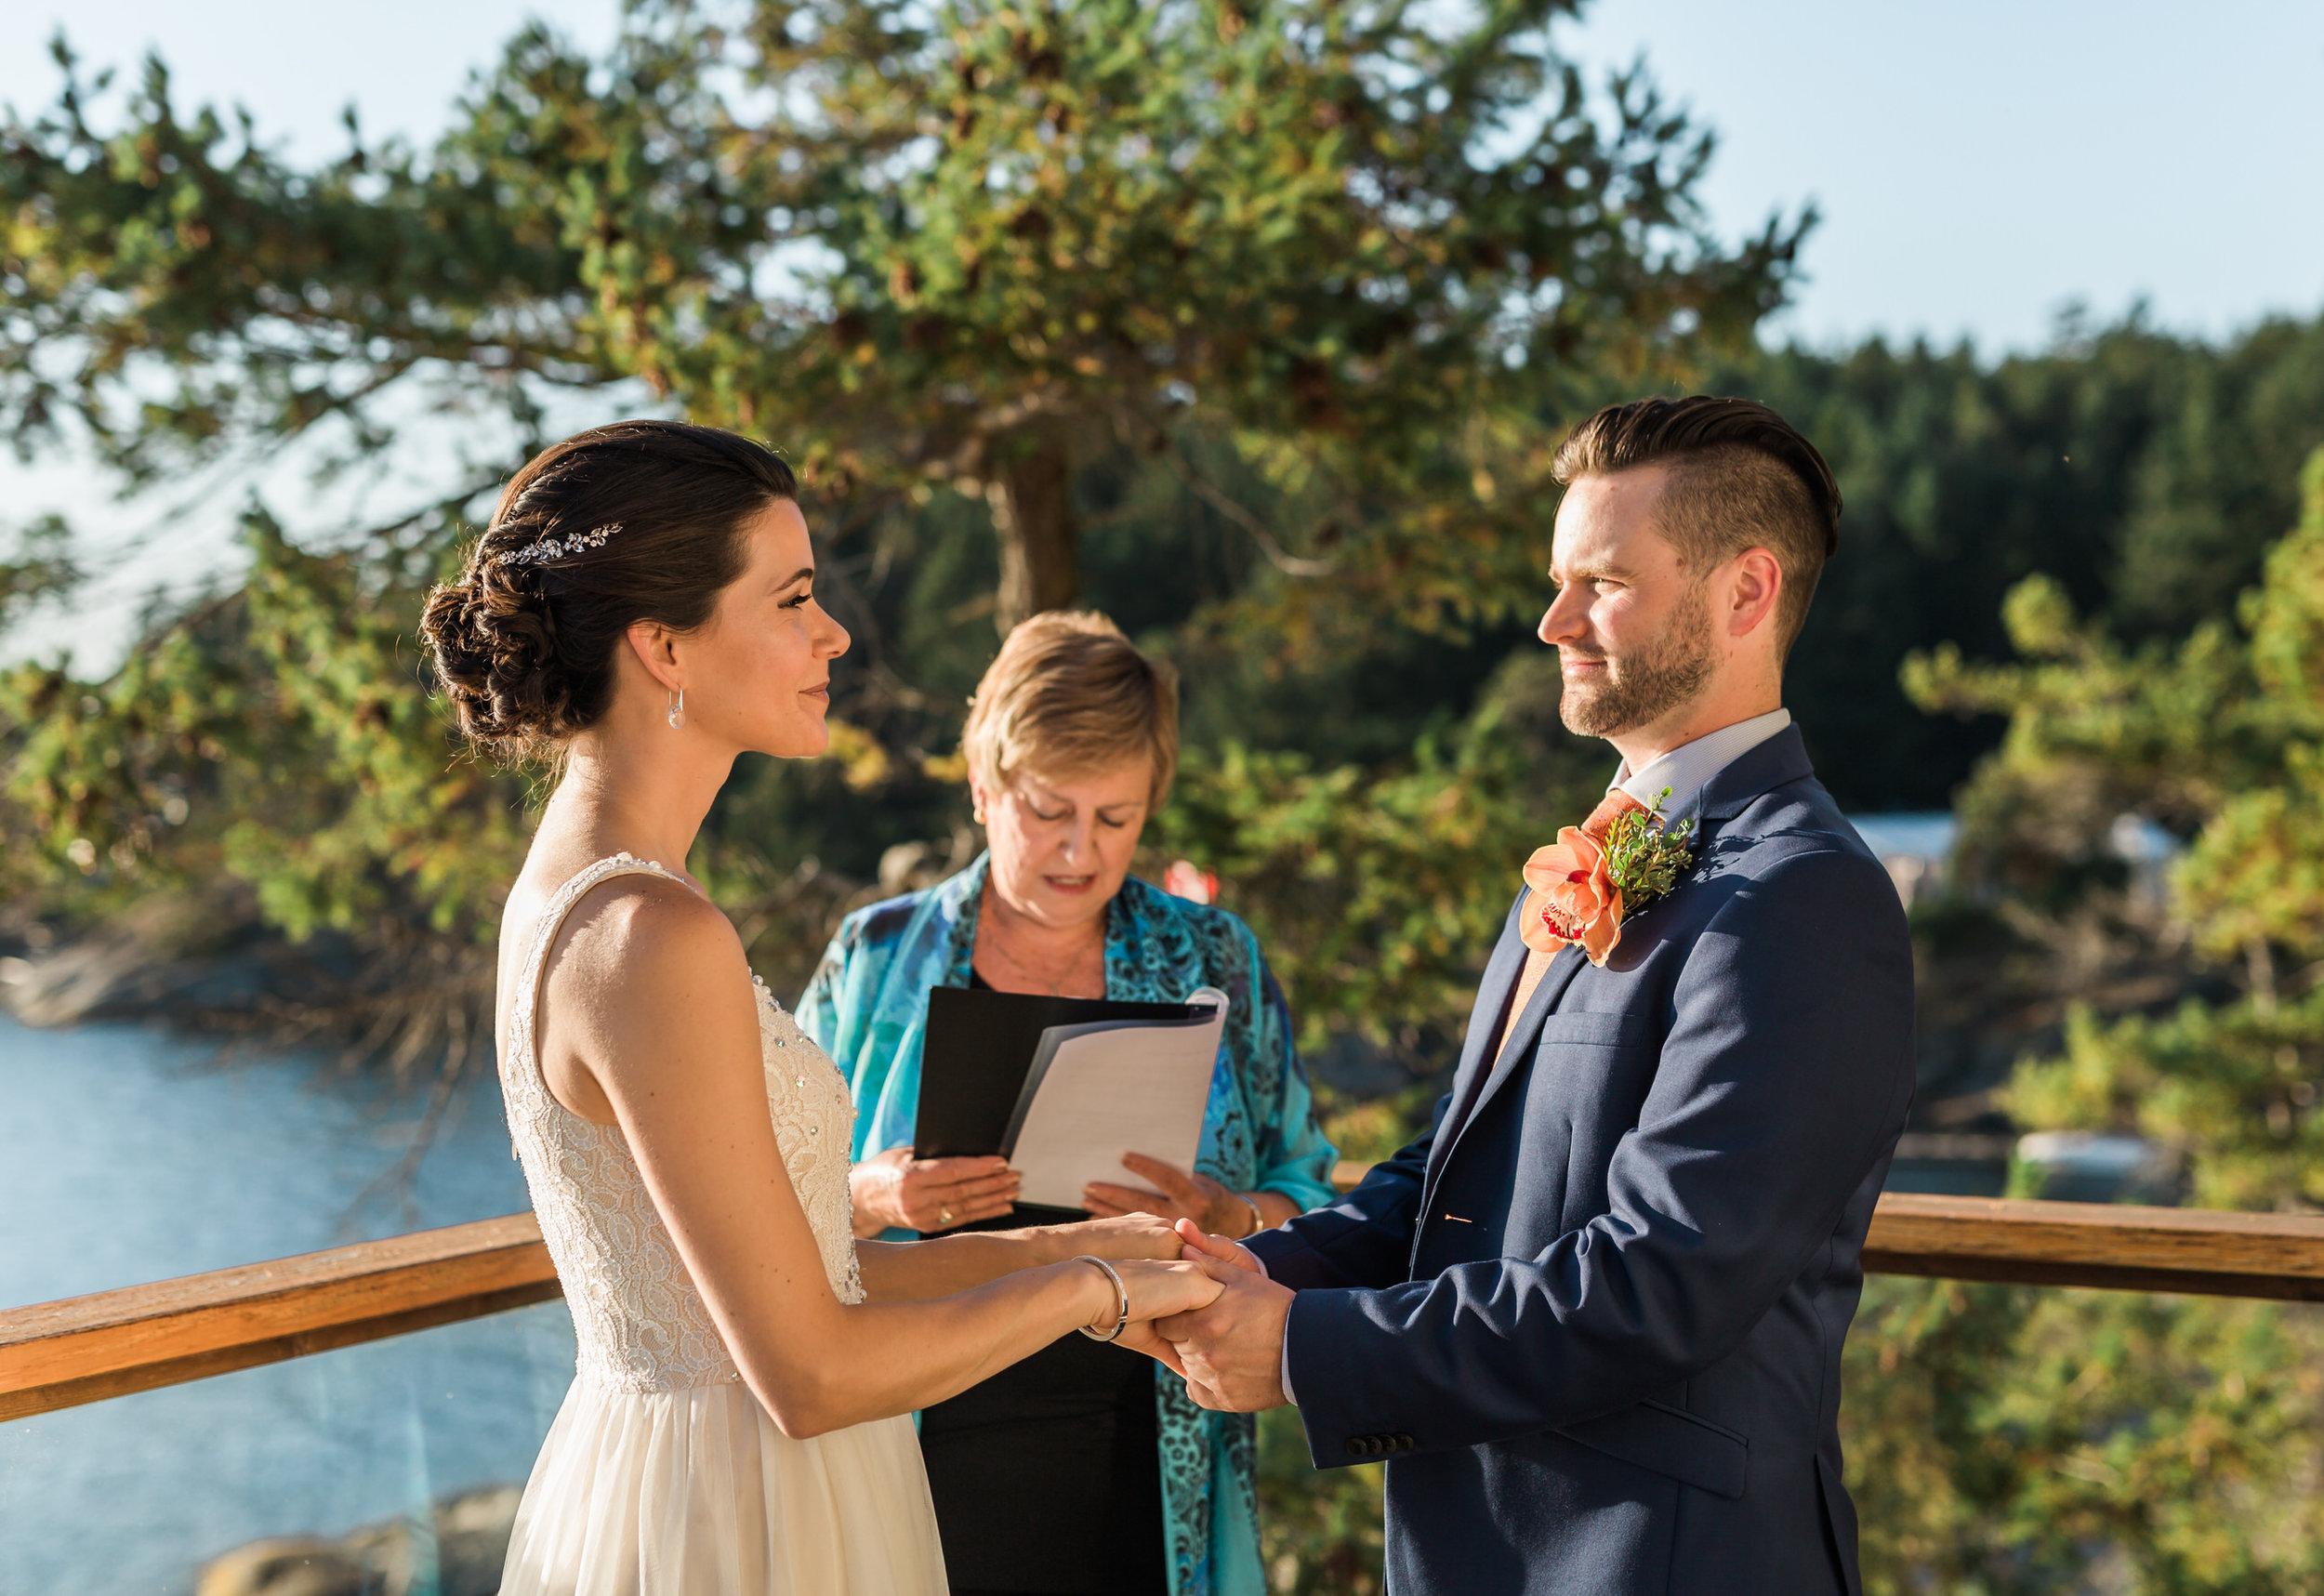 Rockwater Secret Cove Resort Wedding - Sunshine Coast BC Wedding Photographer - Vancouver Wedding Photographer - Sunshine Coast Elopement Photos - IMG_0432.jpg